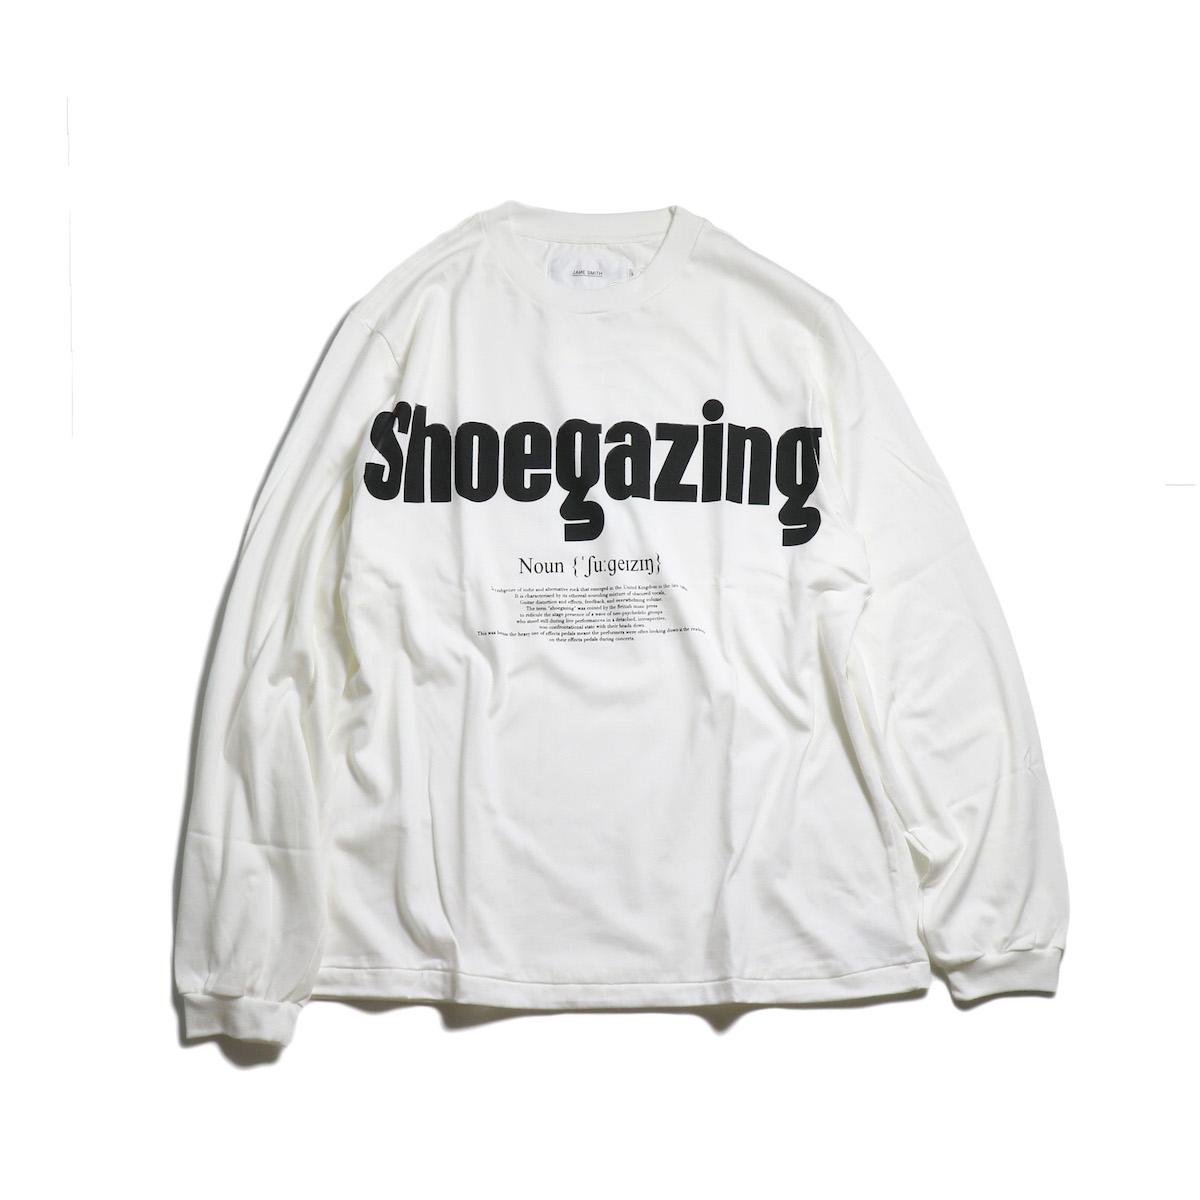 JANE SMITH / SHOEGAZING L/S T-SHIRT -White